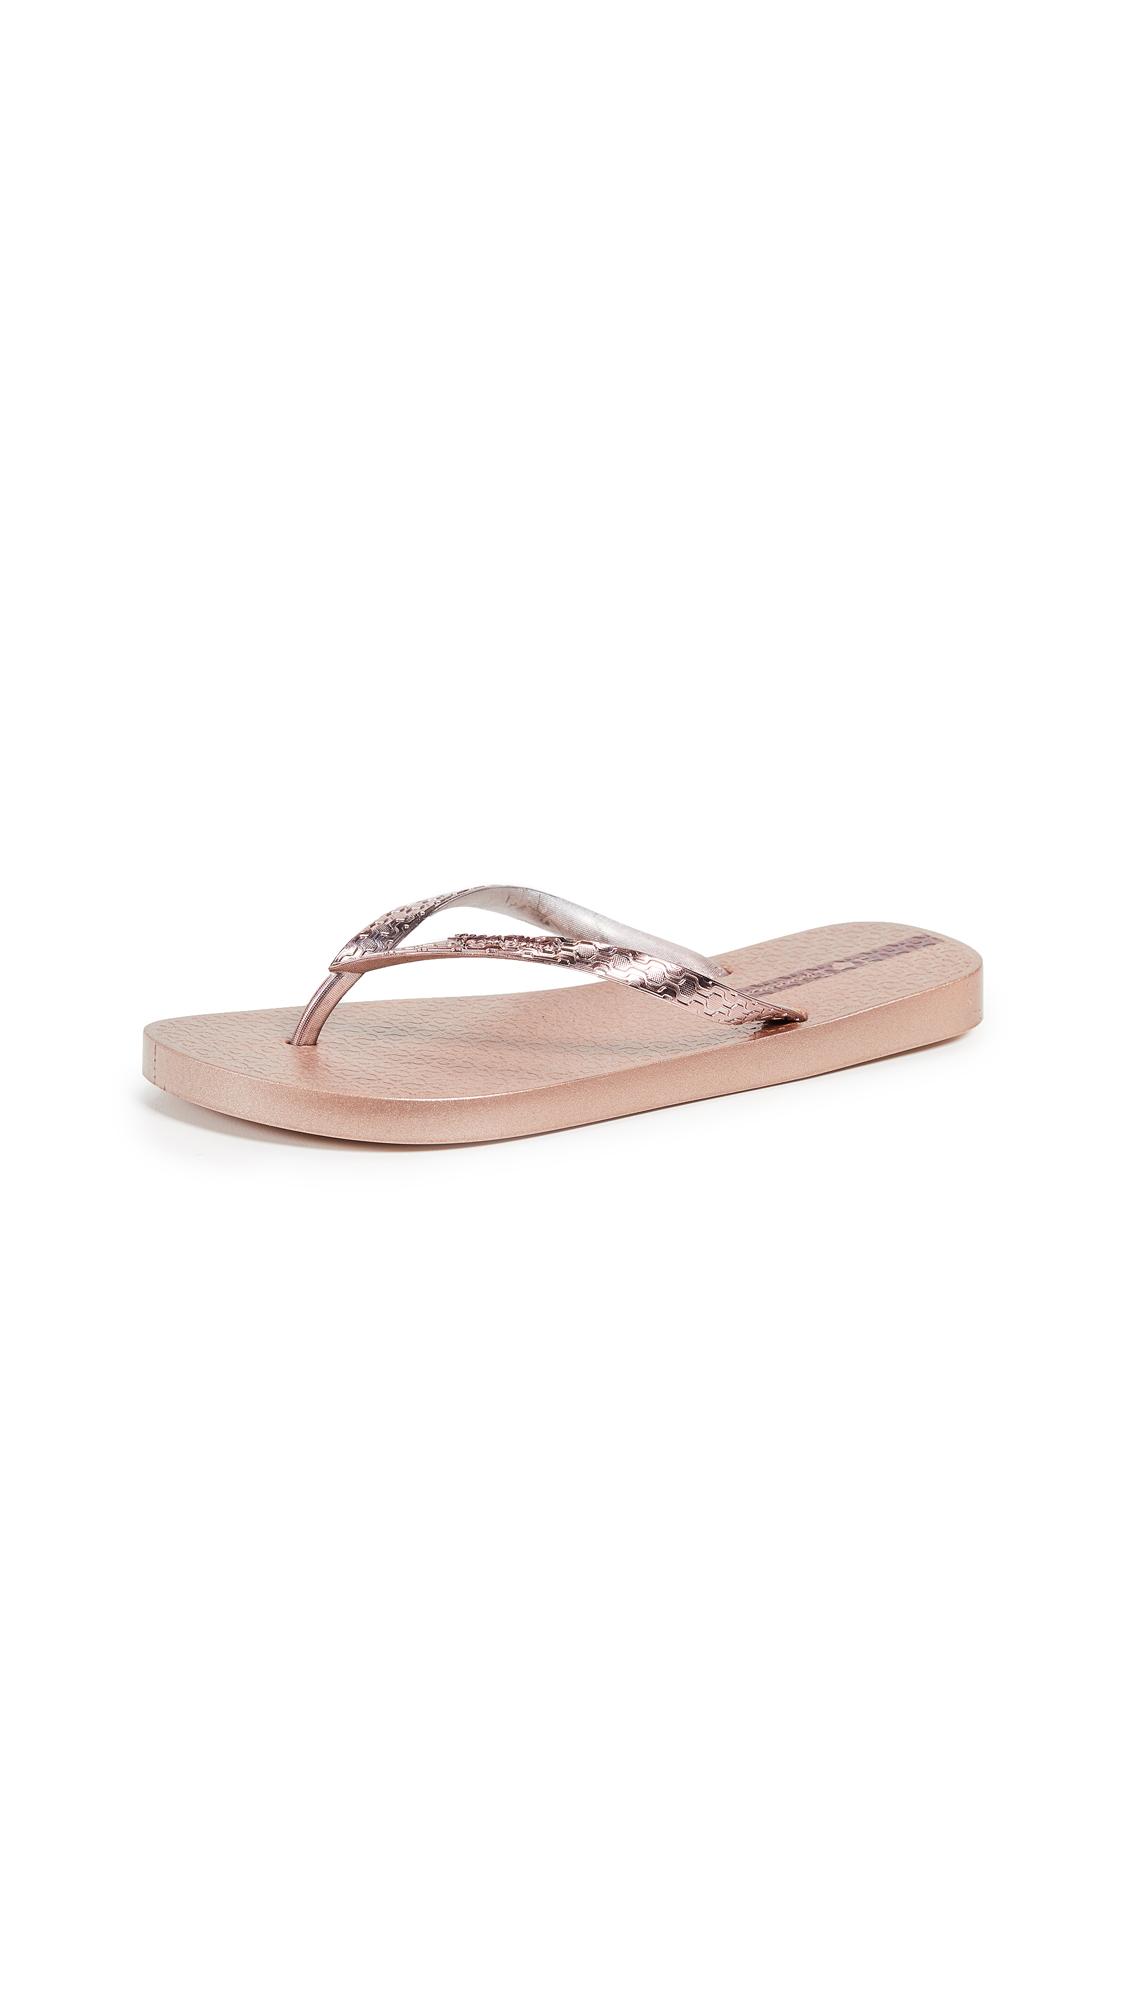 Ipanema Glam Flip Flops - Rose